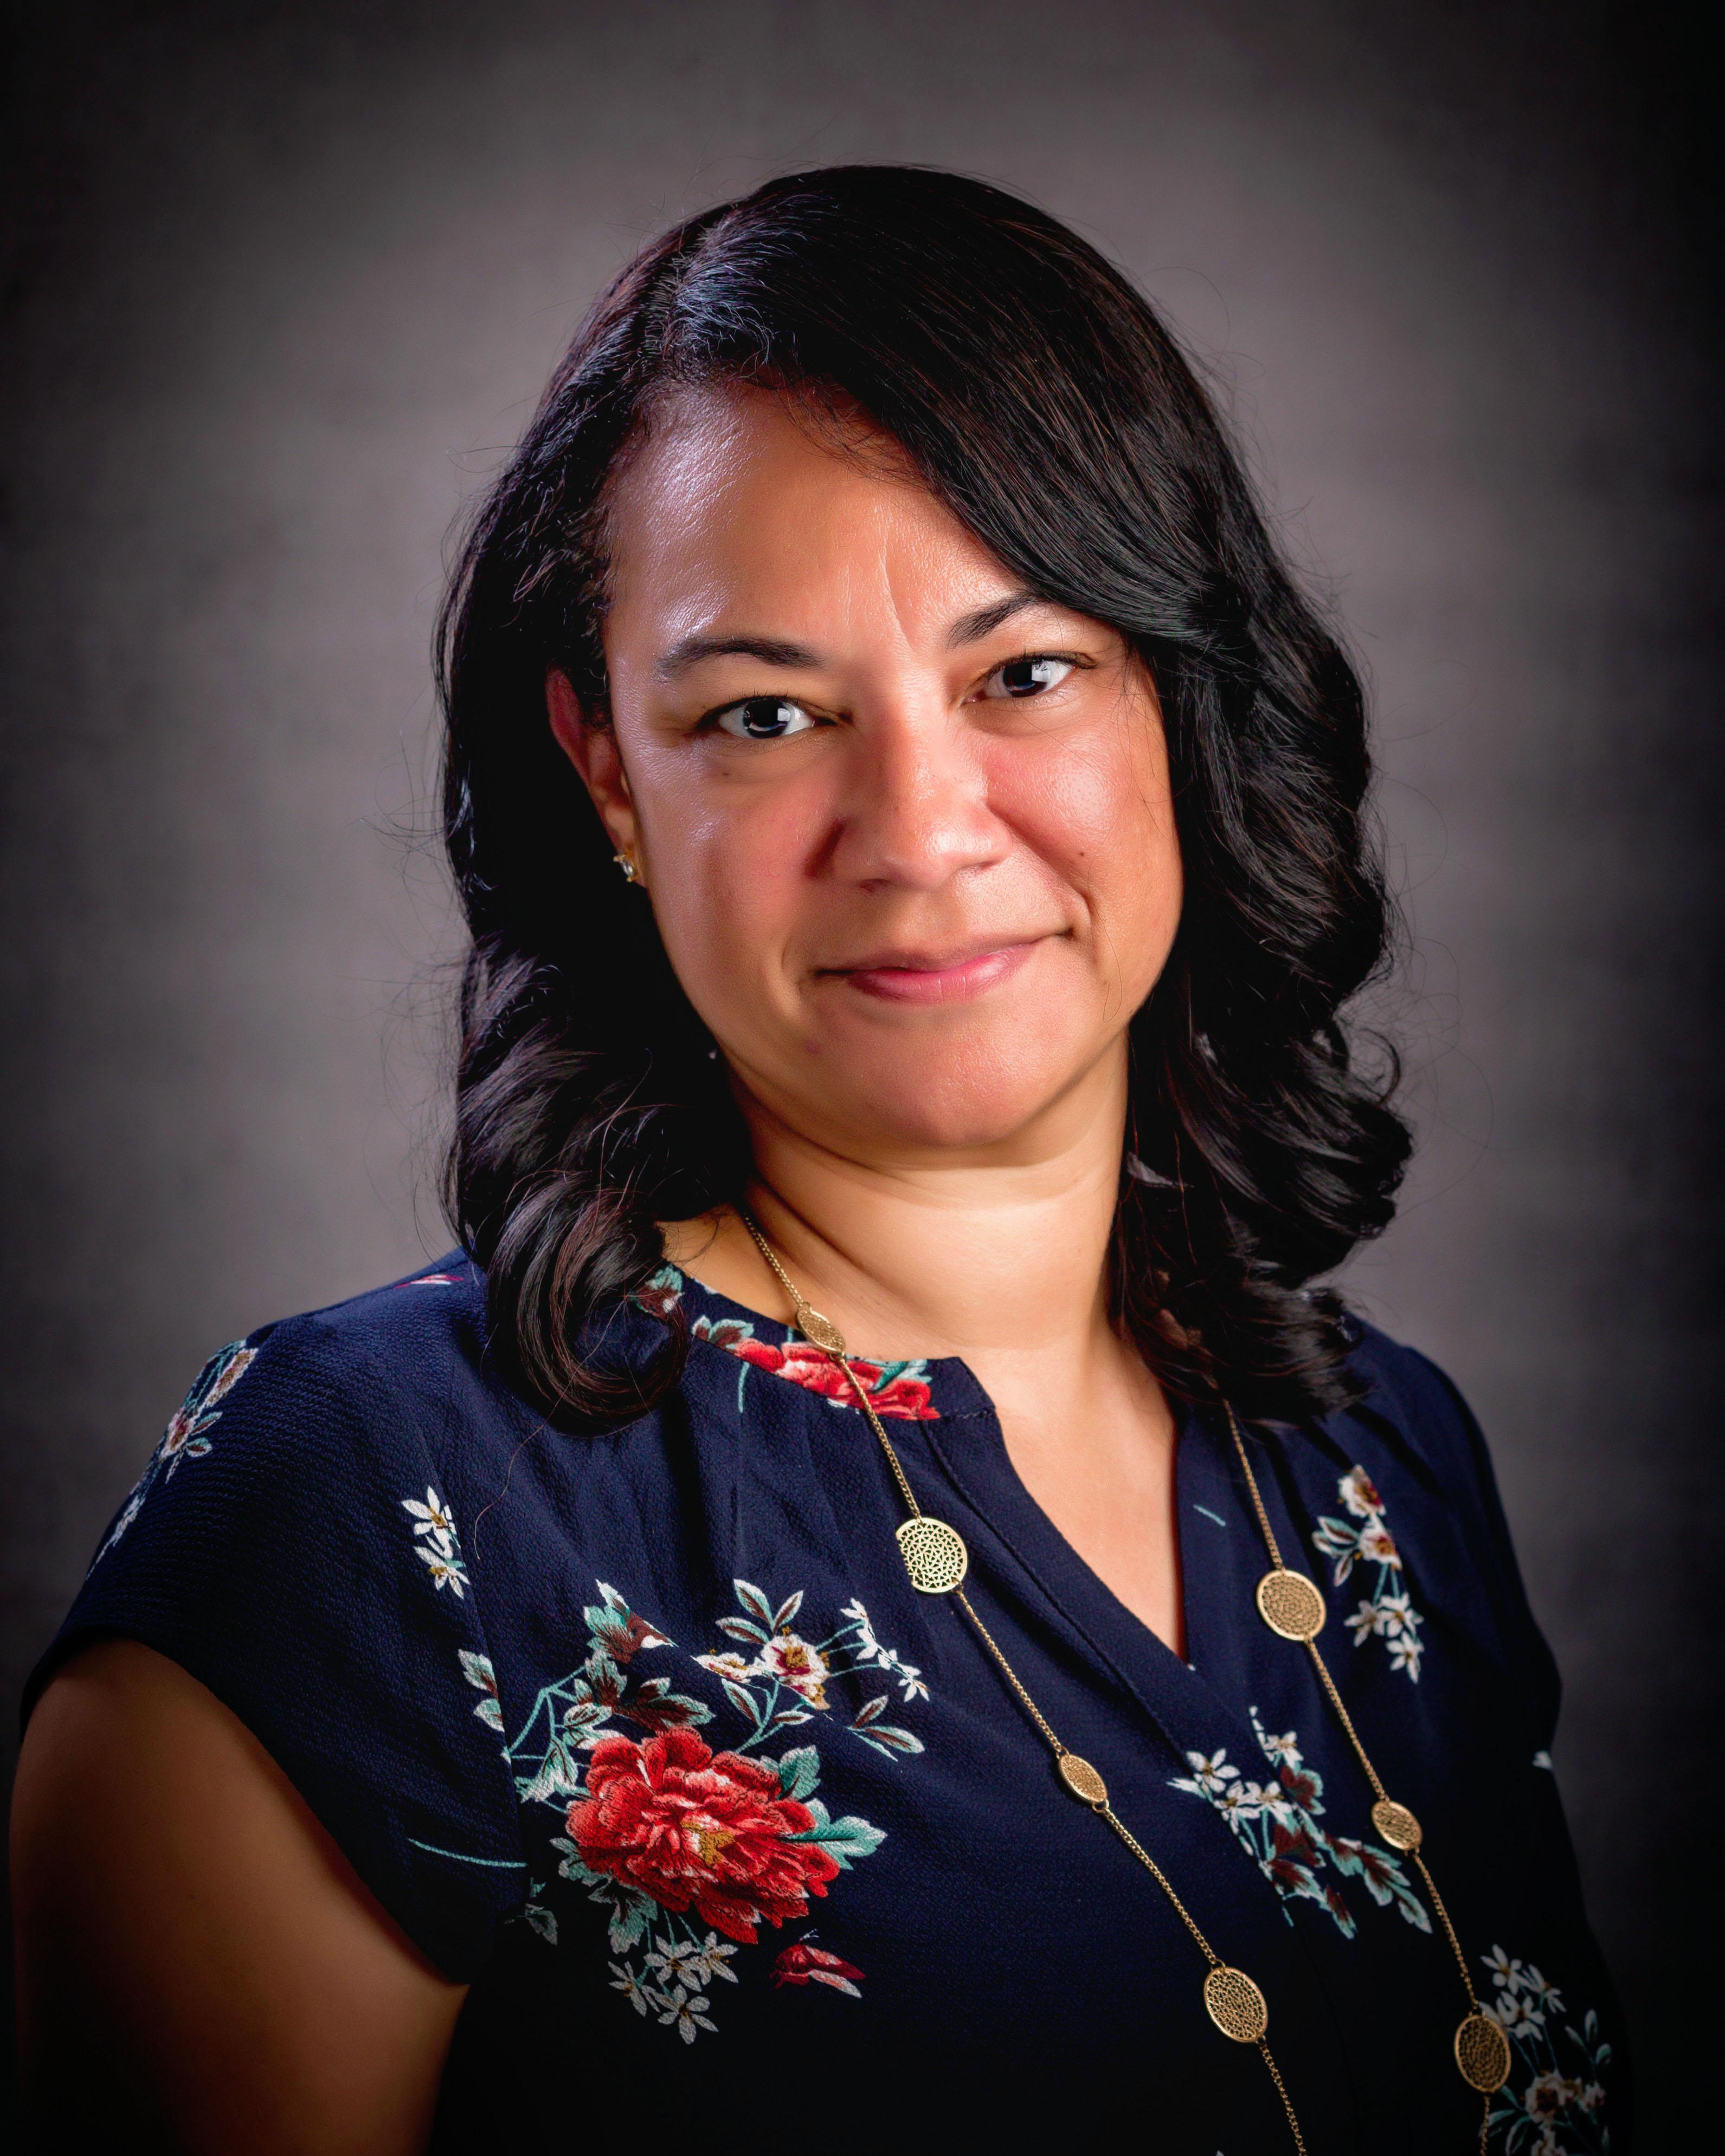 Syreta Evans, Human Resources Coordinator